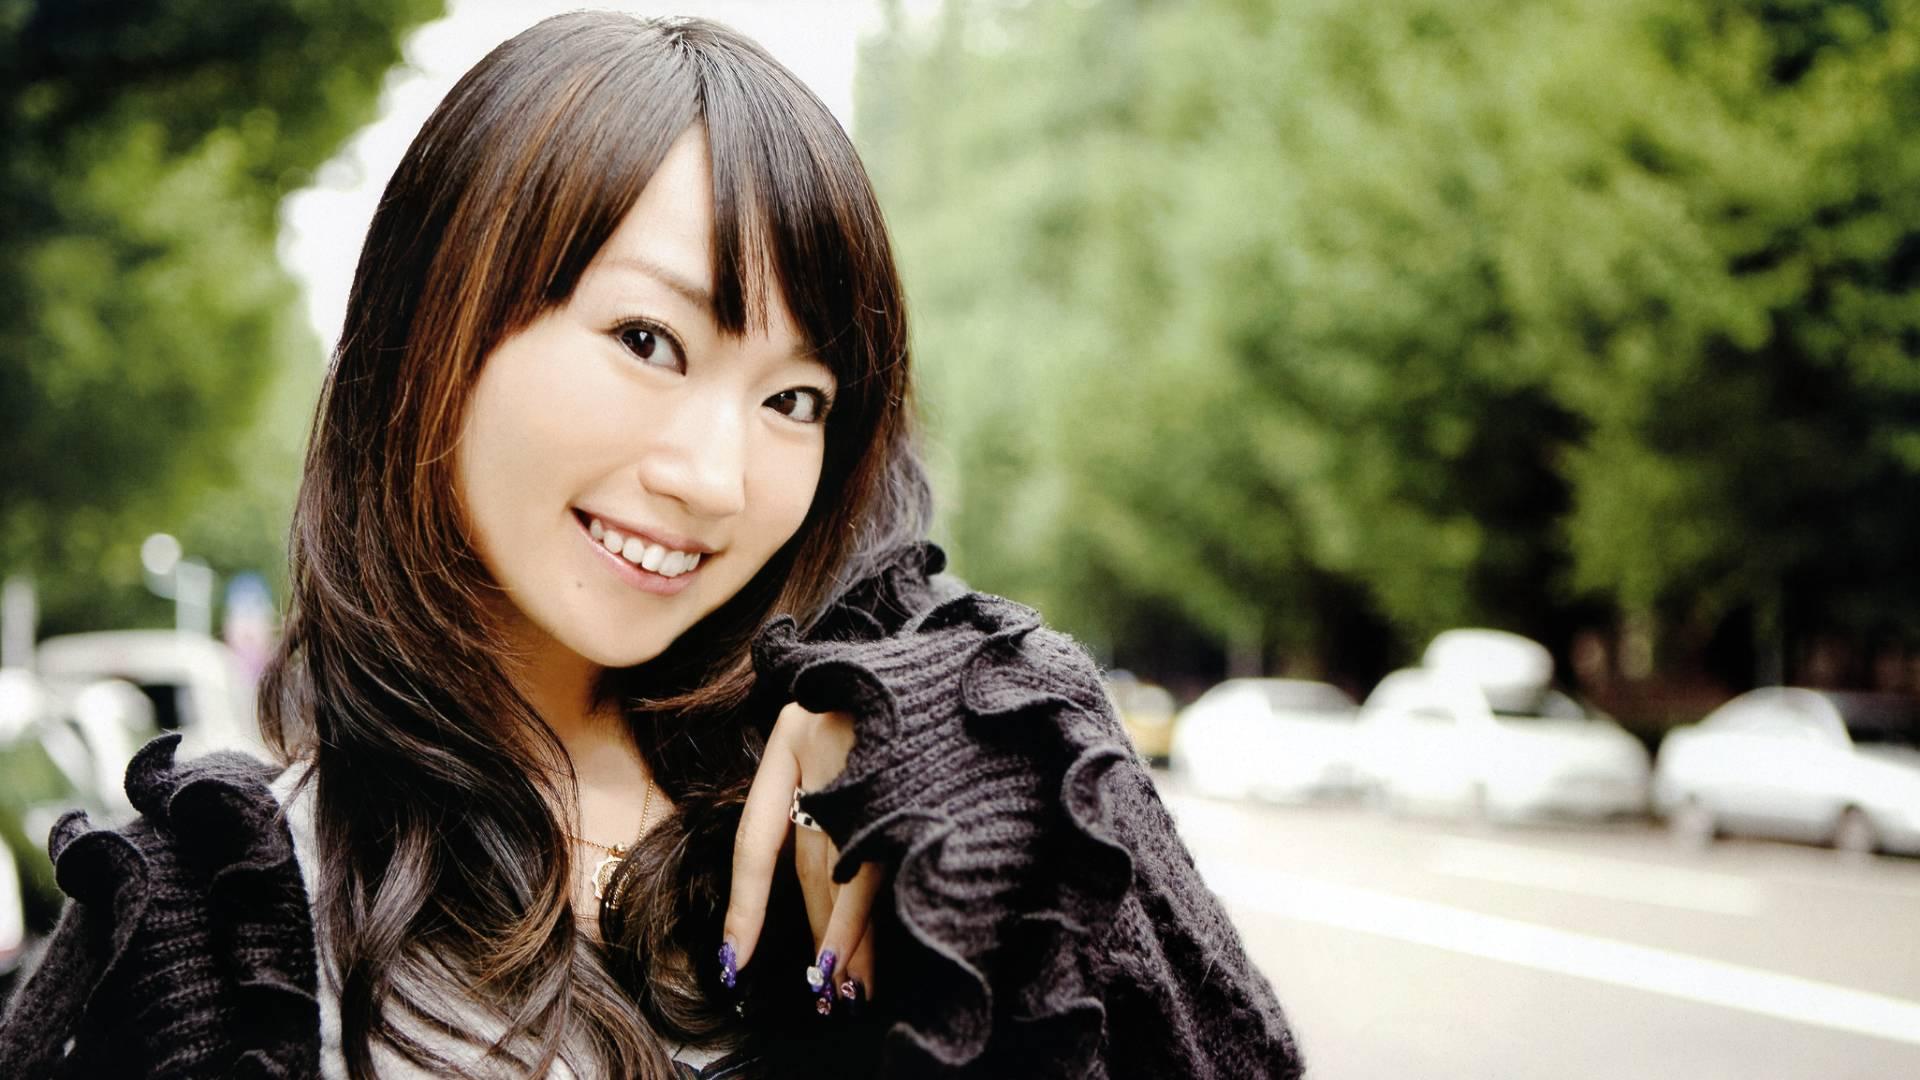 Nana Mizuki Hd Wallpaper 36275 Asiachan Kpop Image Board